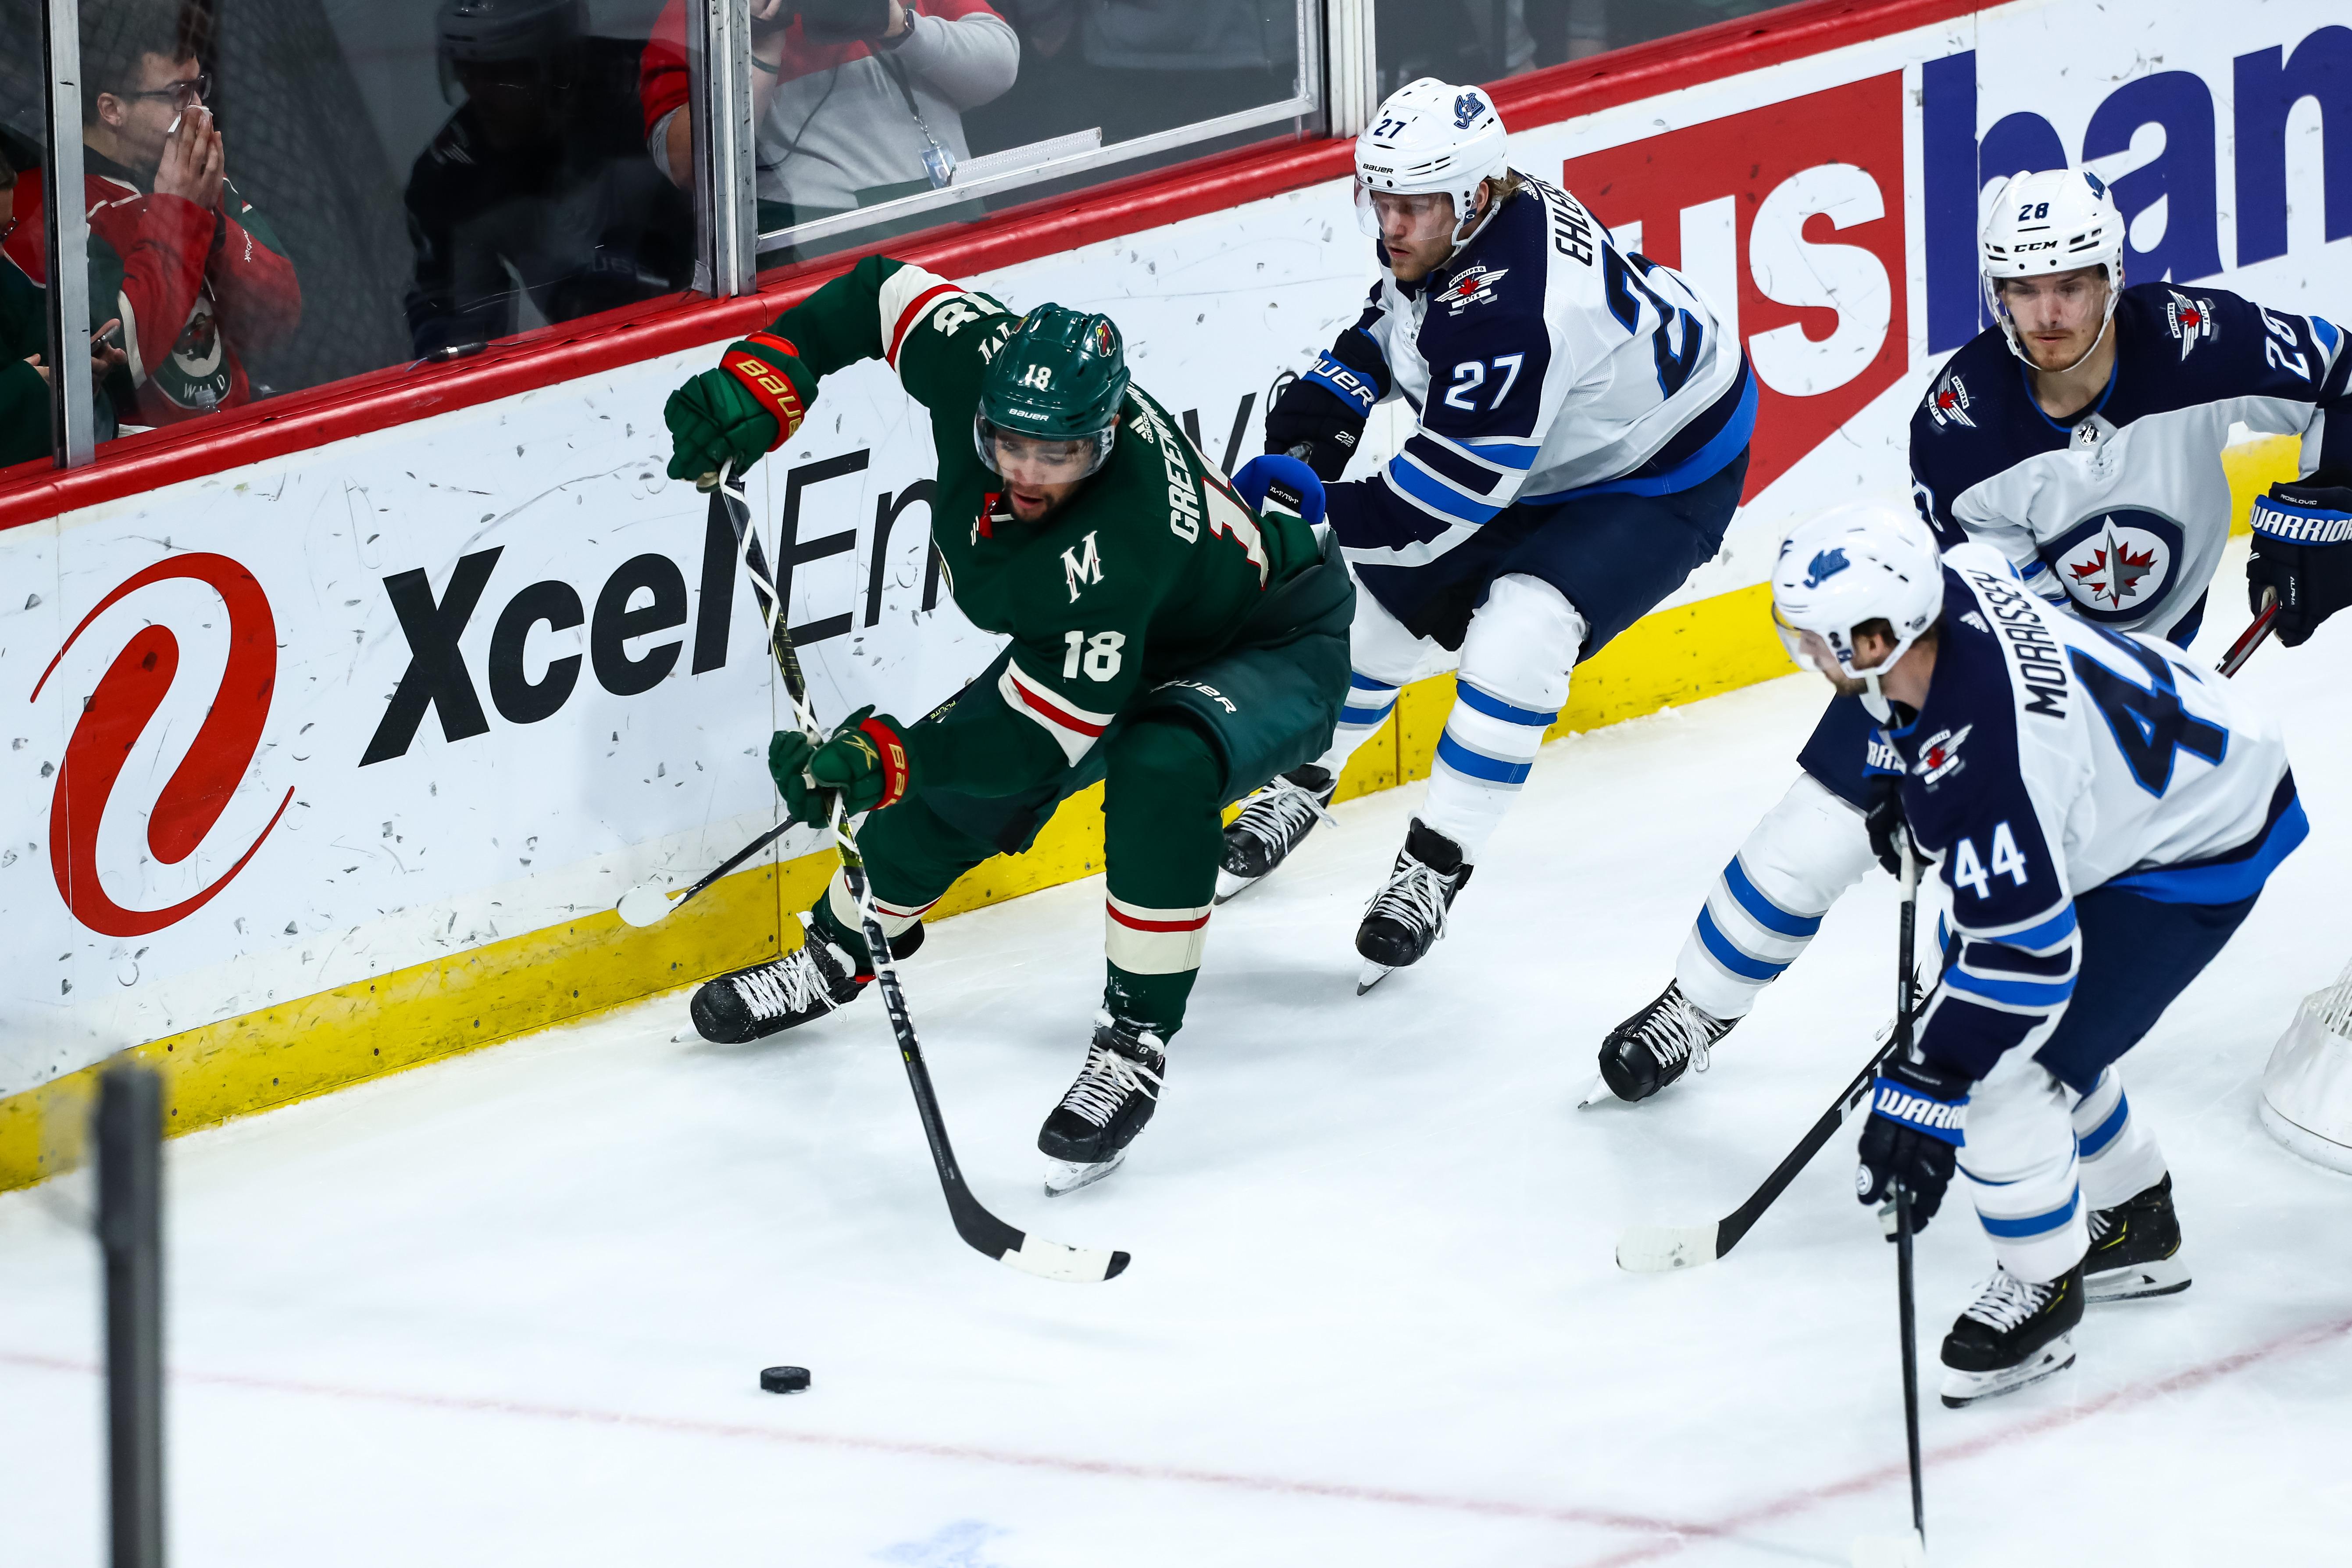 Game Preview: Minnesota Wild vs. Winnipeg Jets 1/4/19 @ 1:00PM CST at Xcel Energy Center